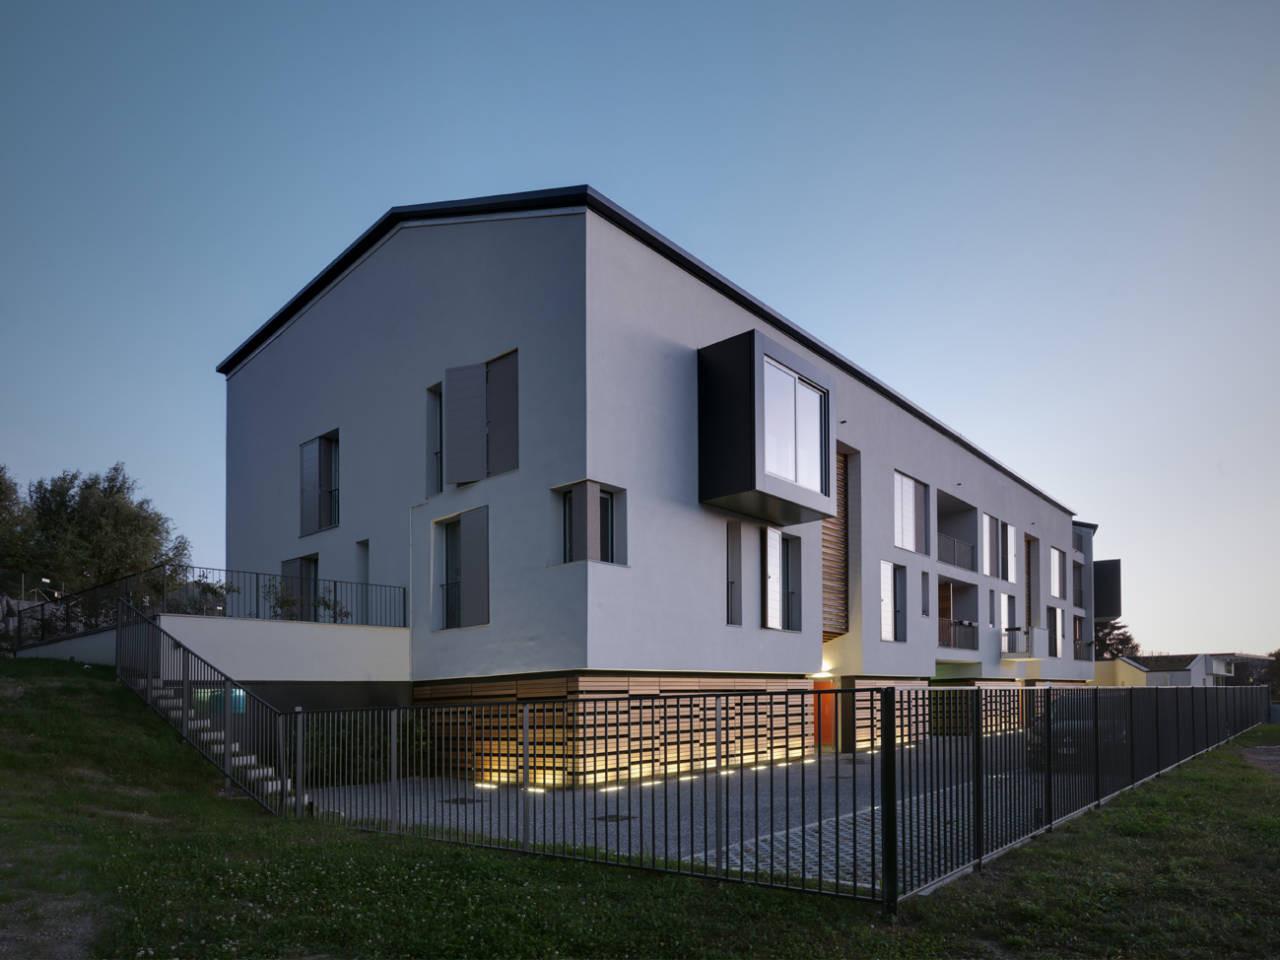 Residencial-Commercial Building In Azzate / Park Associati, © Andrea Martiradonna